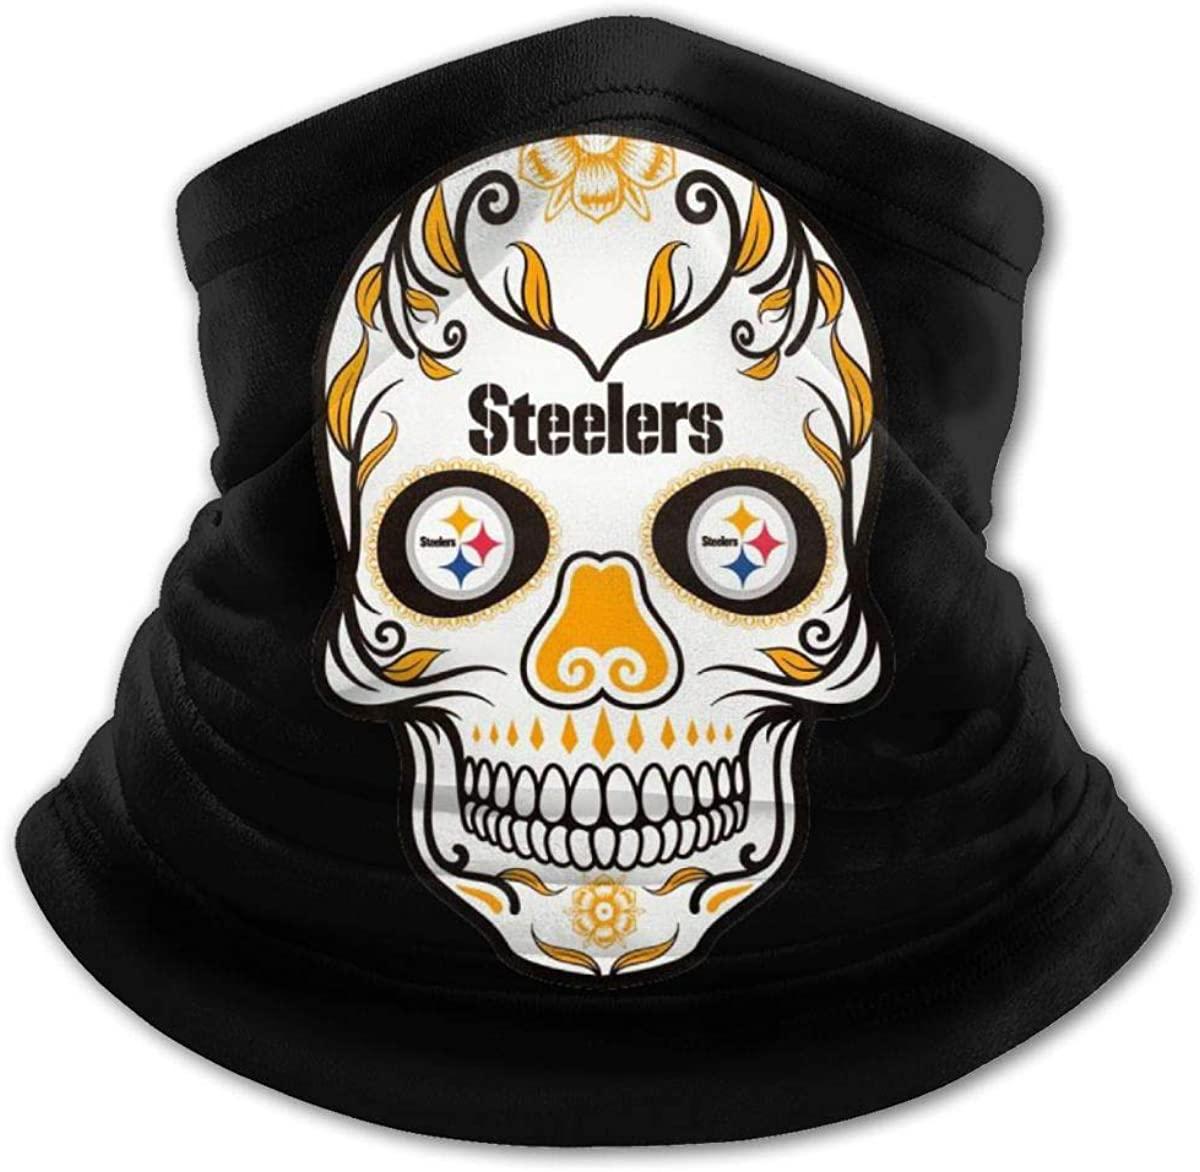 Head Scarf, Pittsburgh Steelers Skull Windproof Face Mask Headbands Bandana Head Wrap Balaclava for Youth Boys Girls